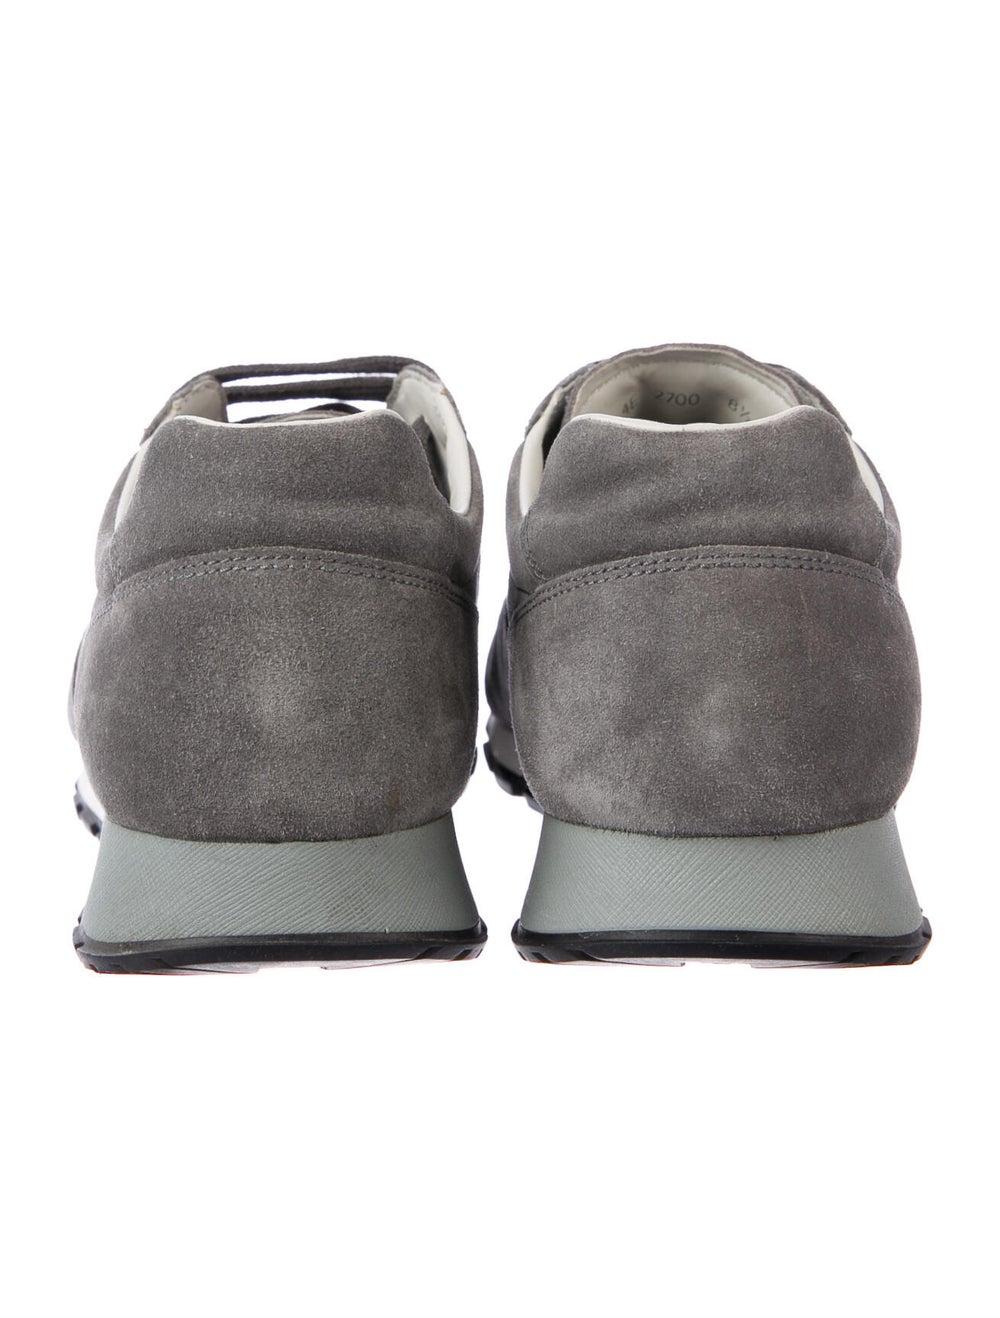 Prada Sport Suede Sneakers Grey - image 4